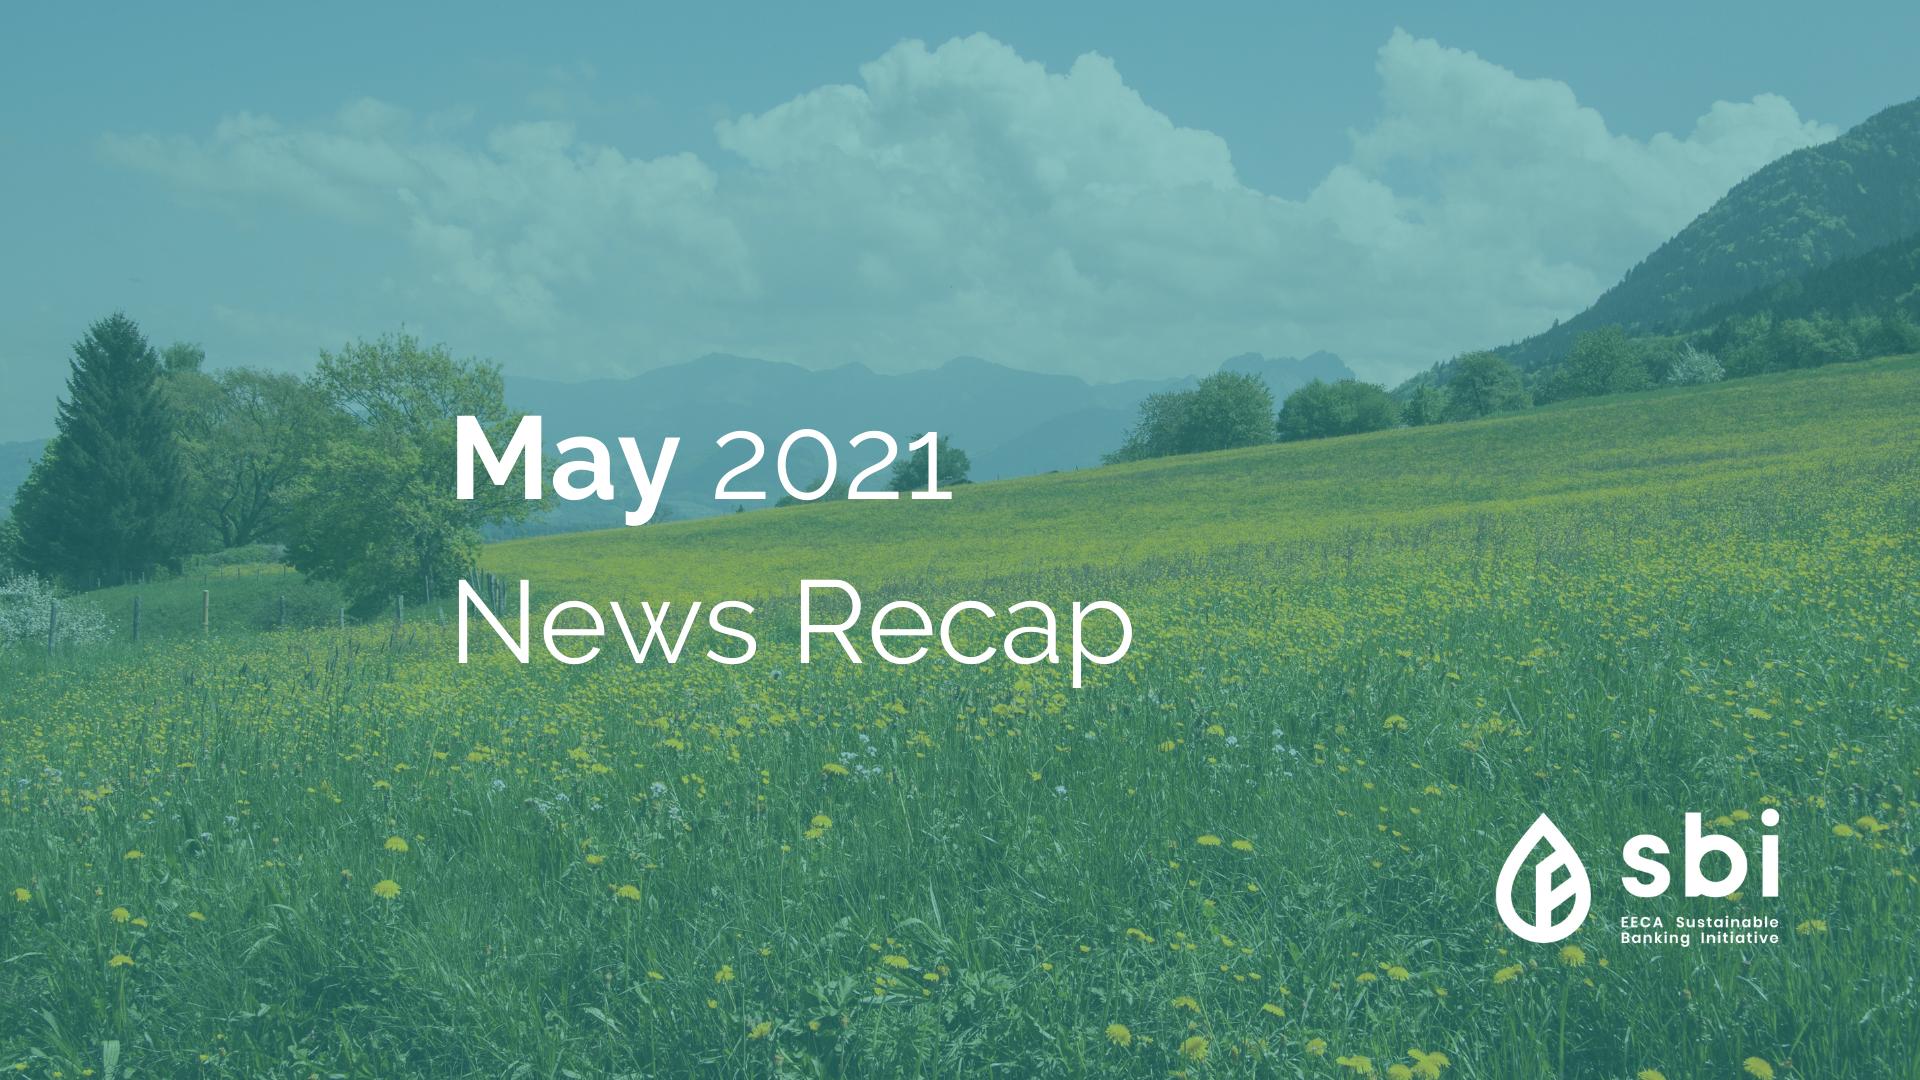 May 2021 News Recap